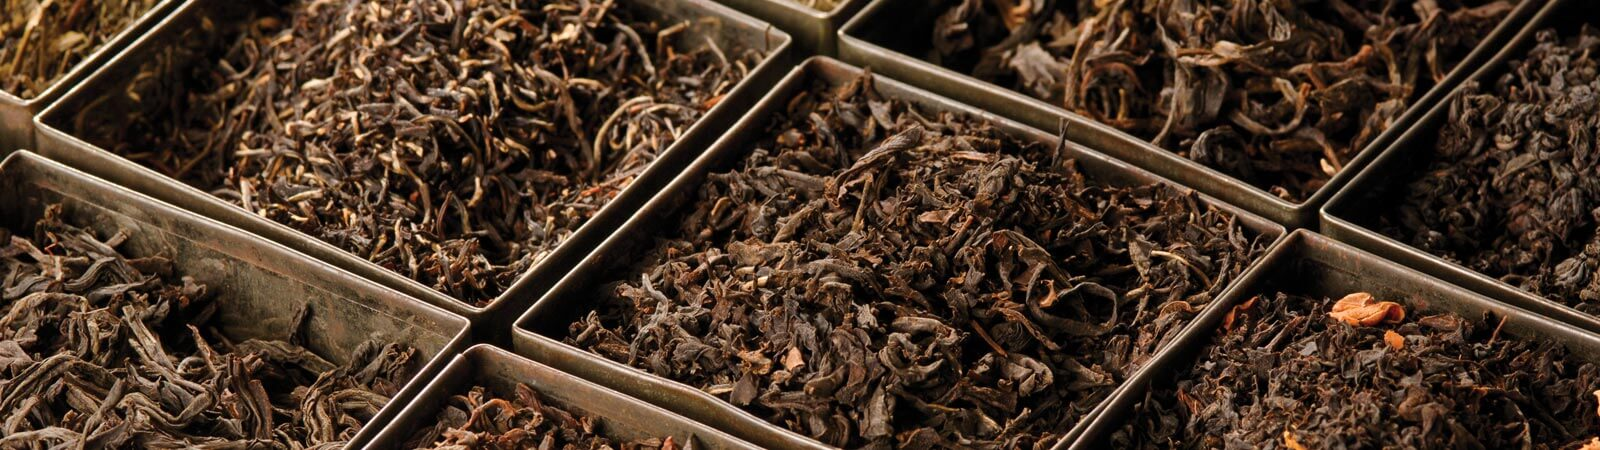 Black tea, green tea, white tea, oolong tea and infusions by MJF Exports